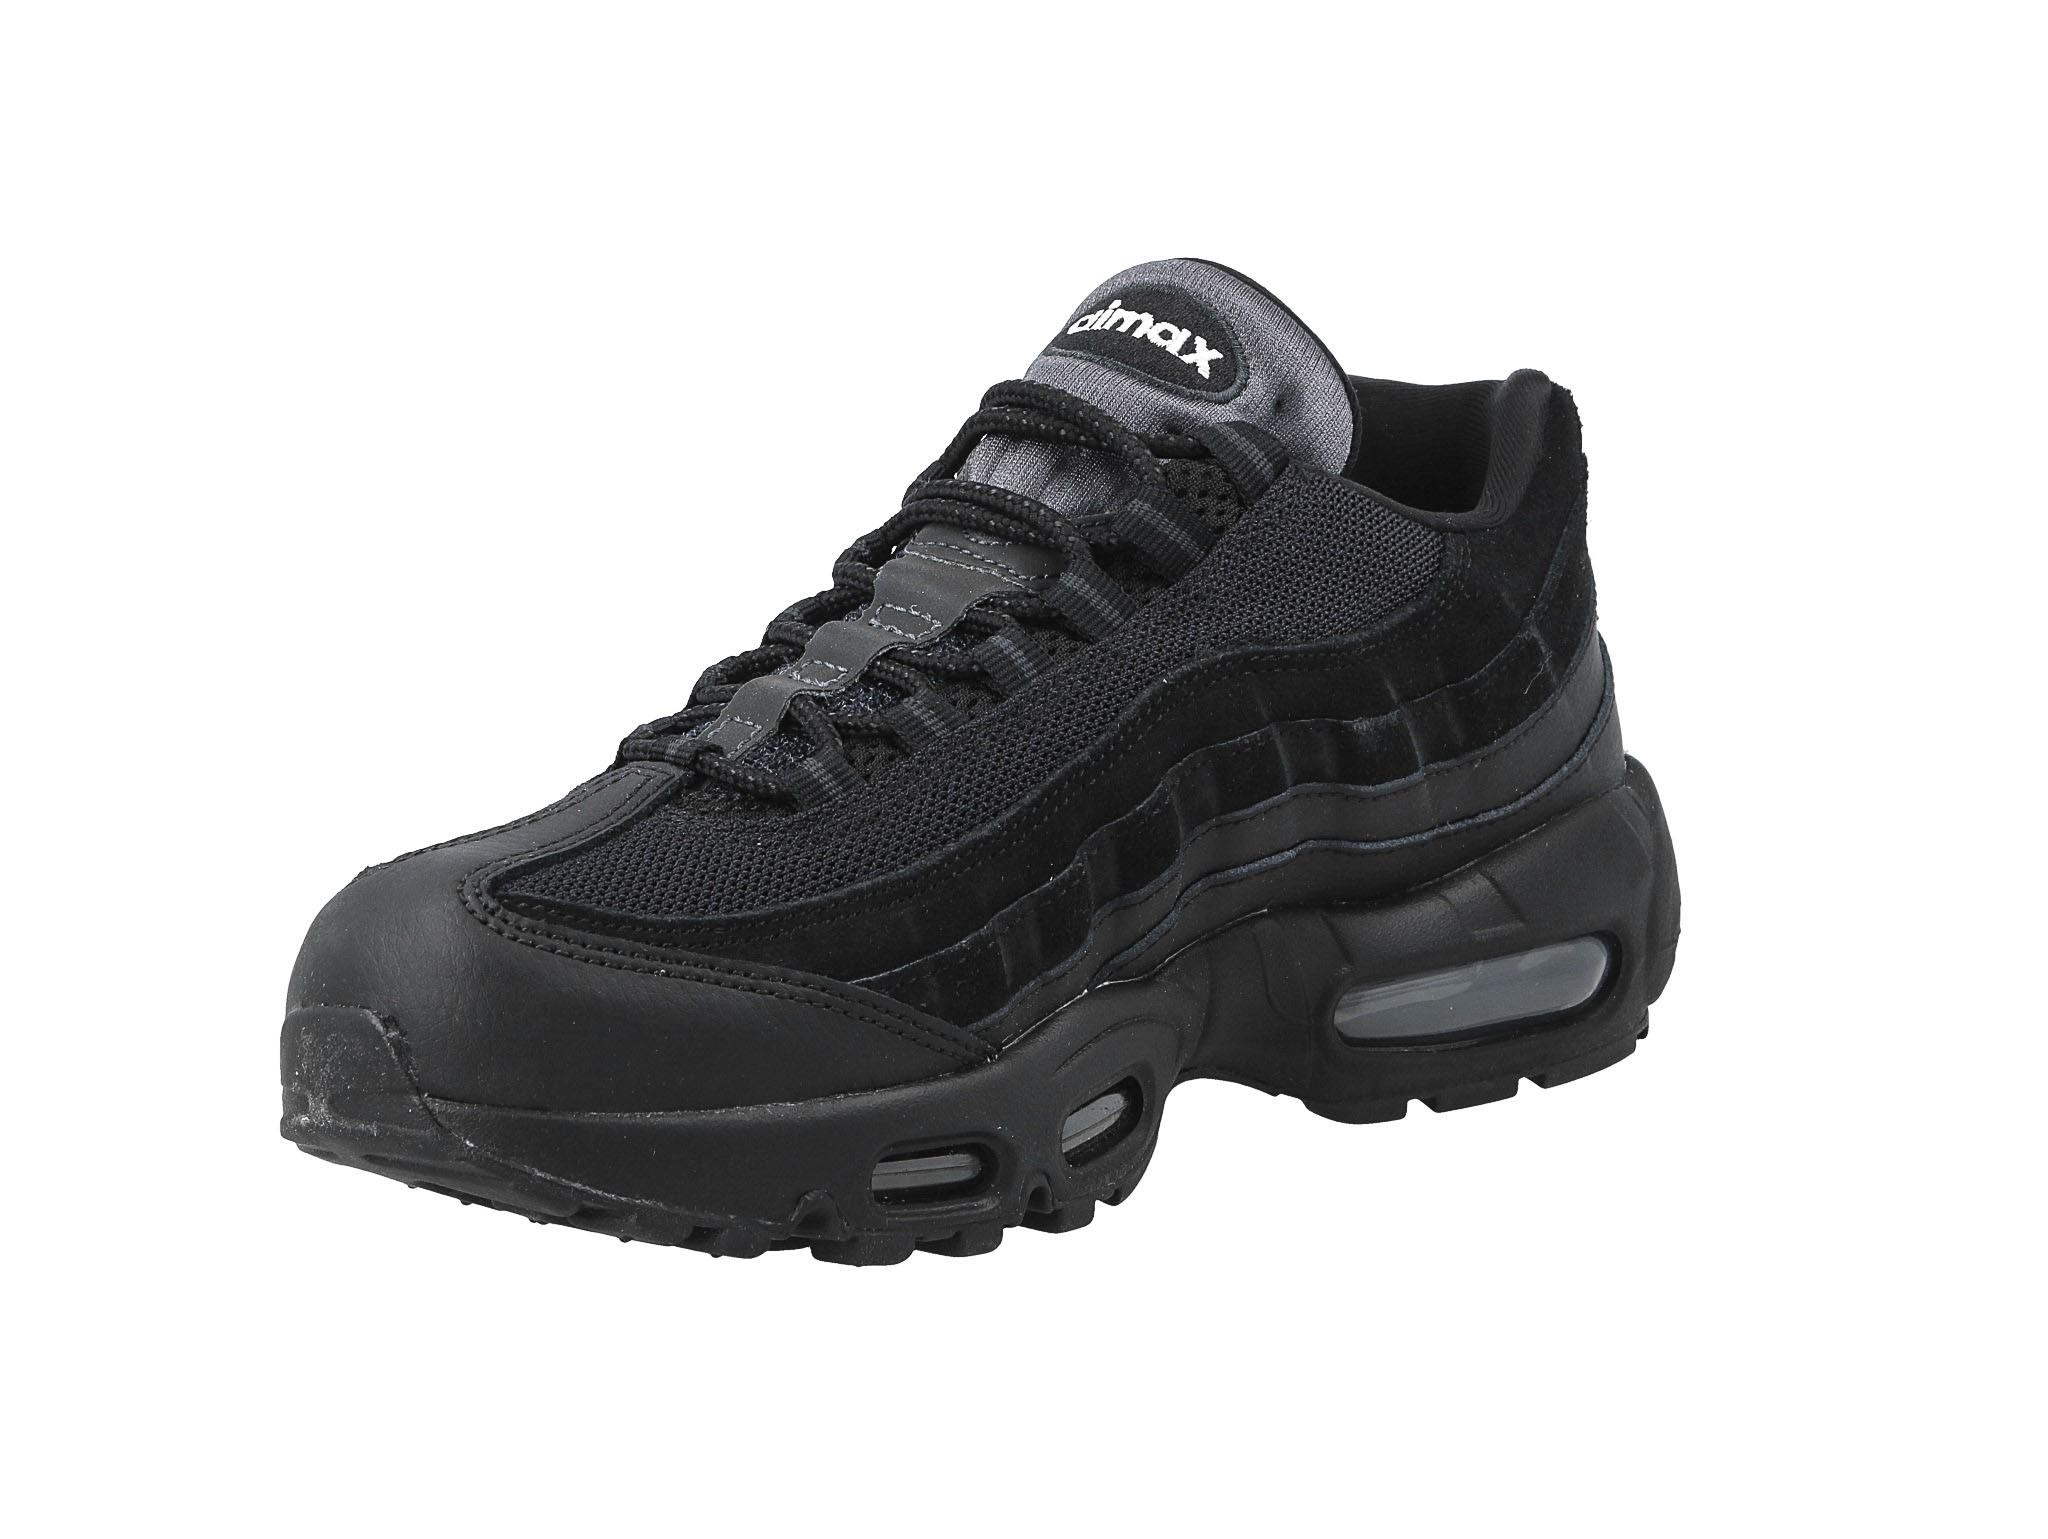 Nike Air Max 95 Trainers In All Black Blackblackanthraci